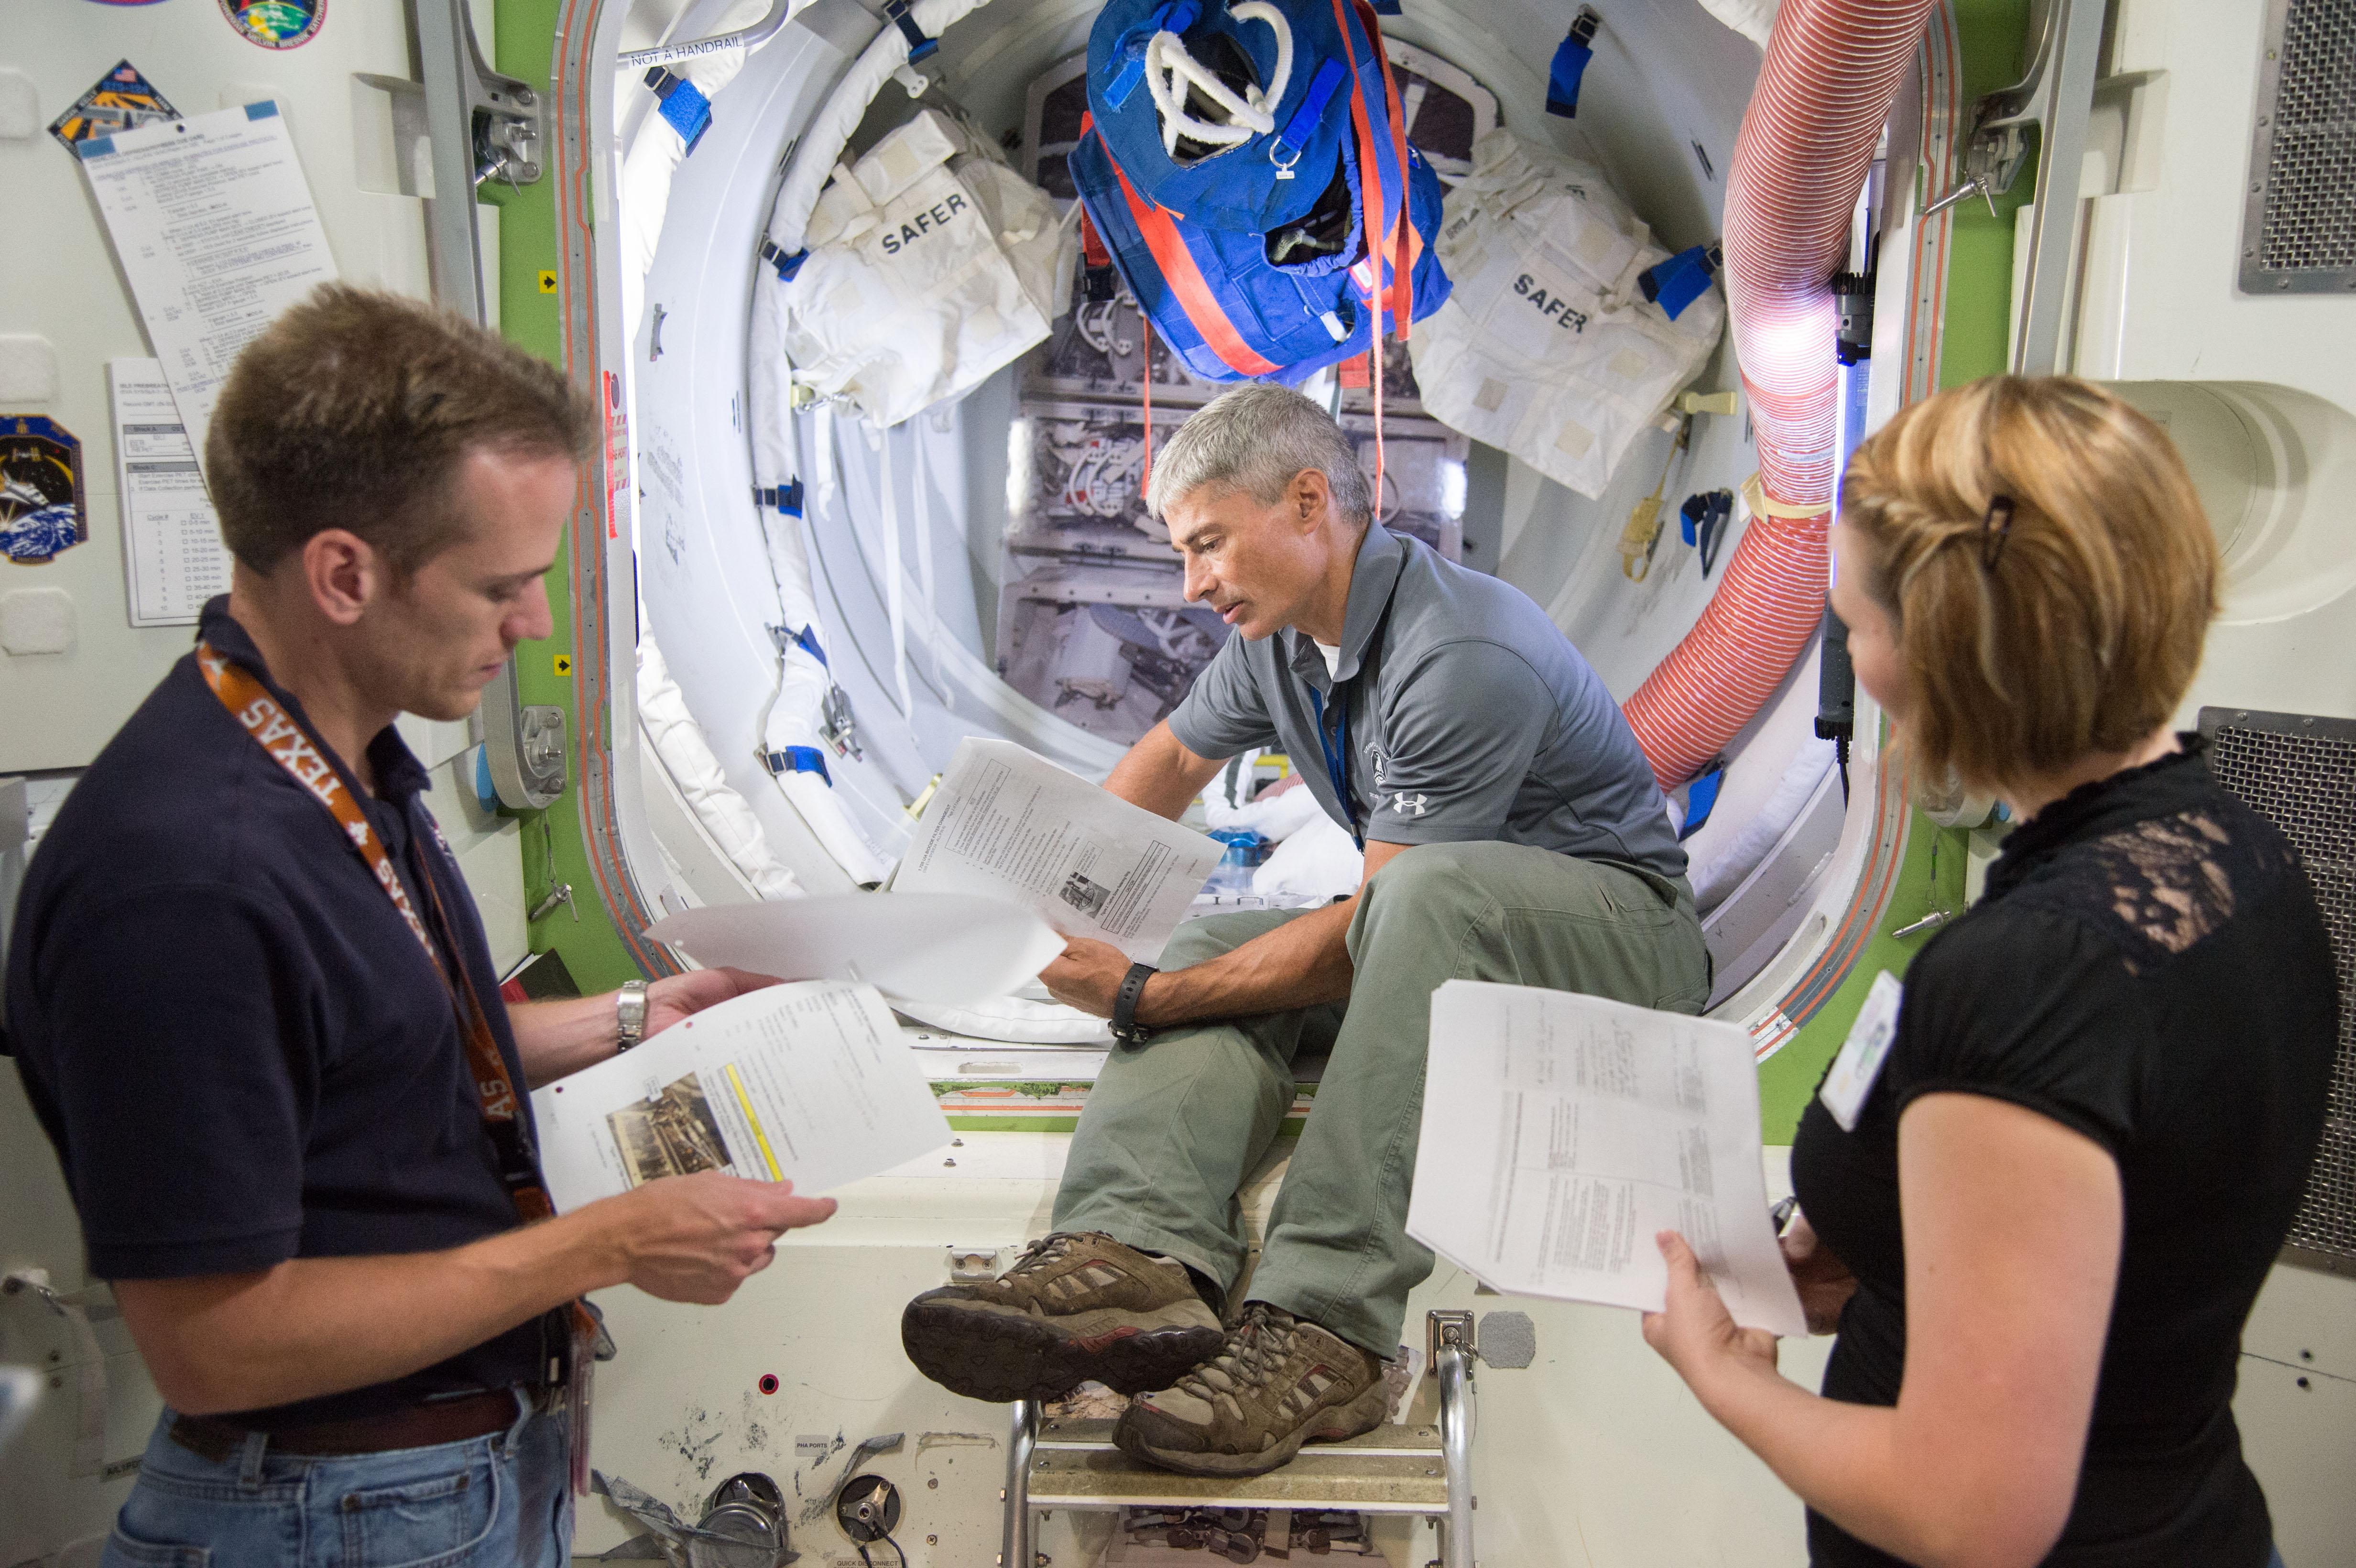 mars mission crew quarters - photo #25